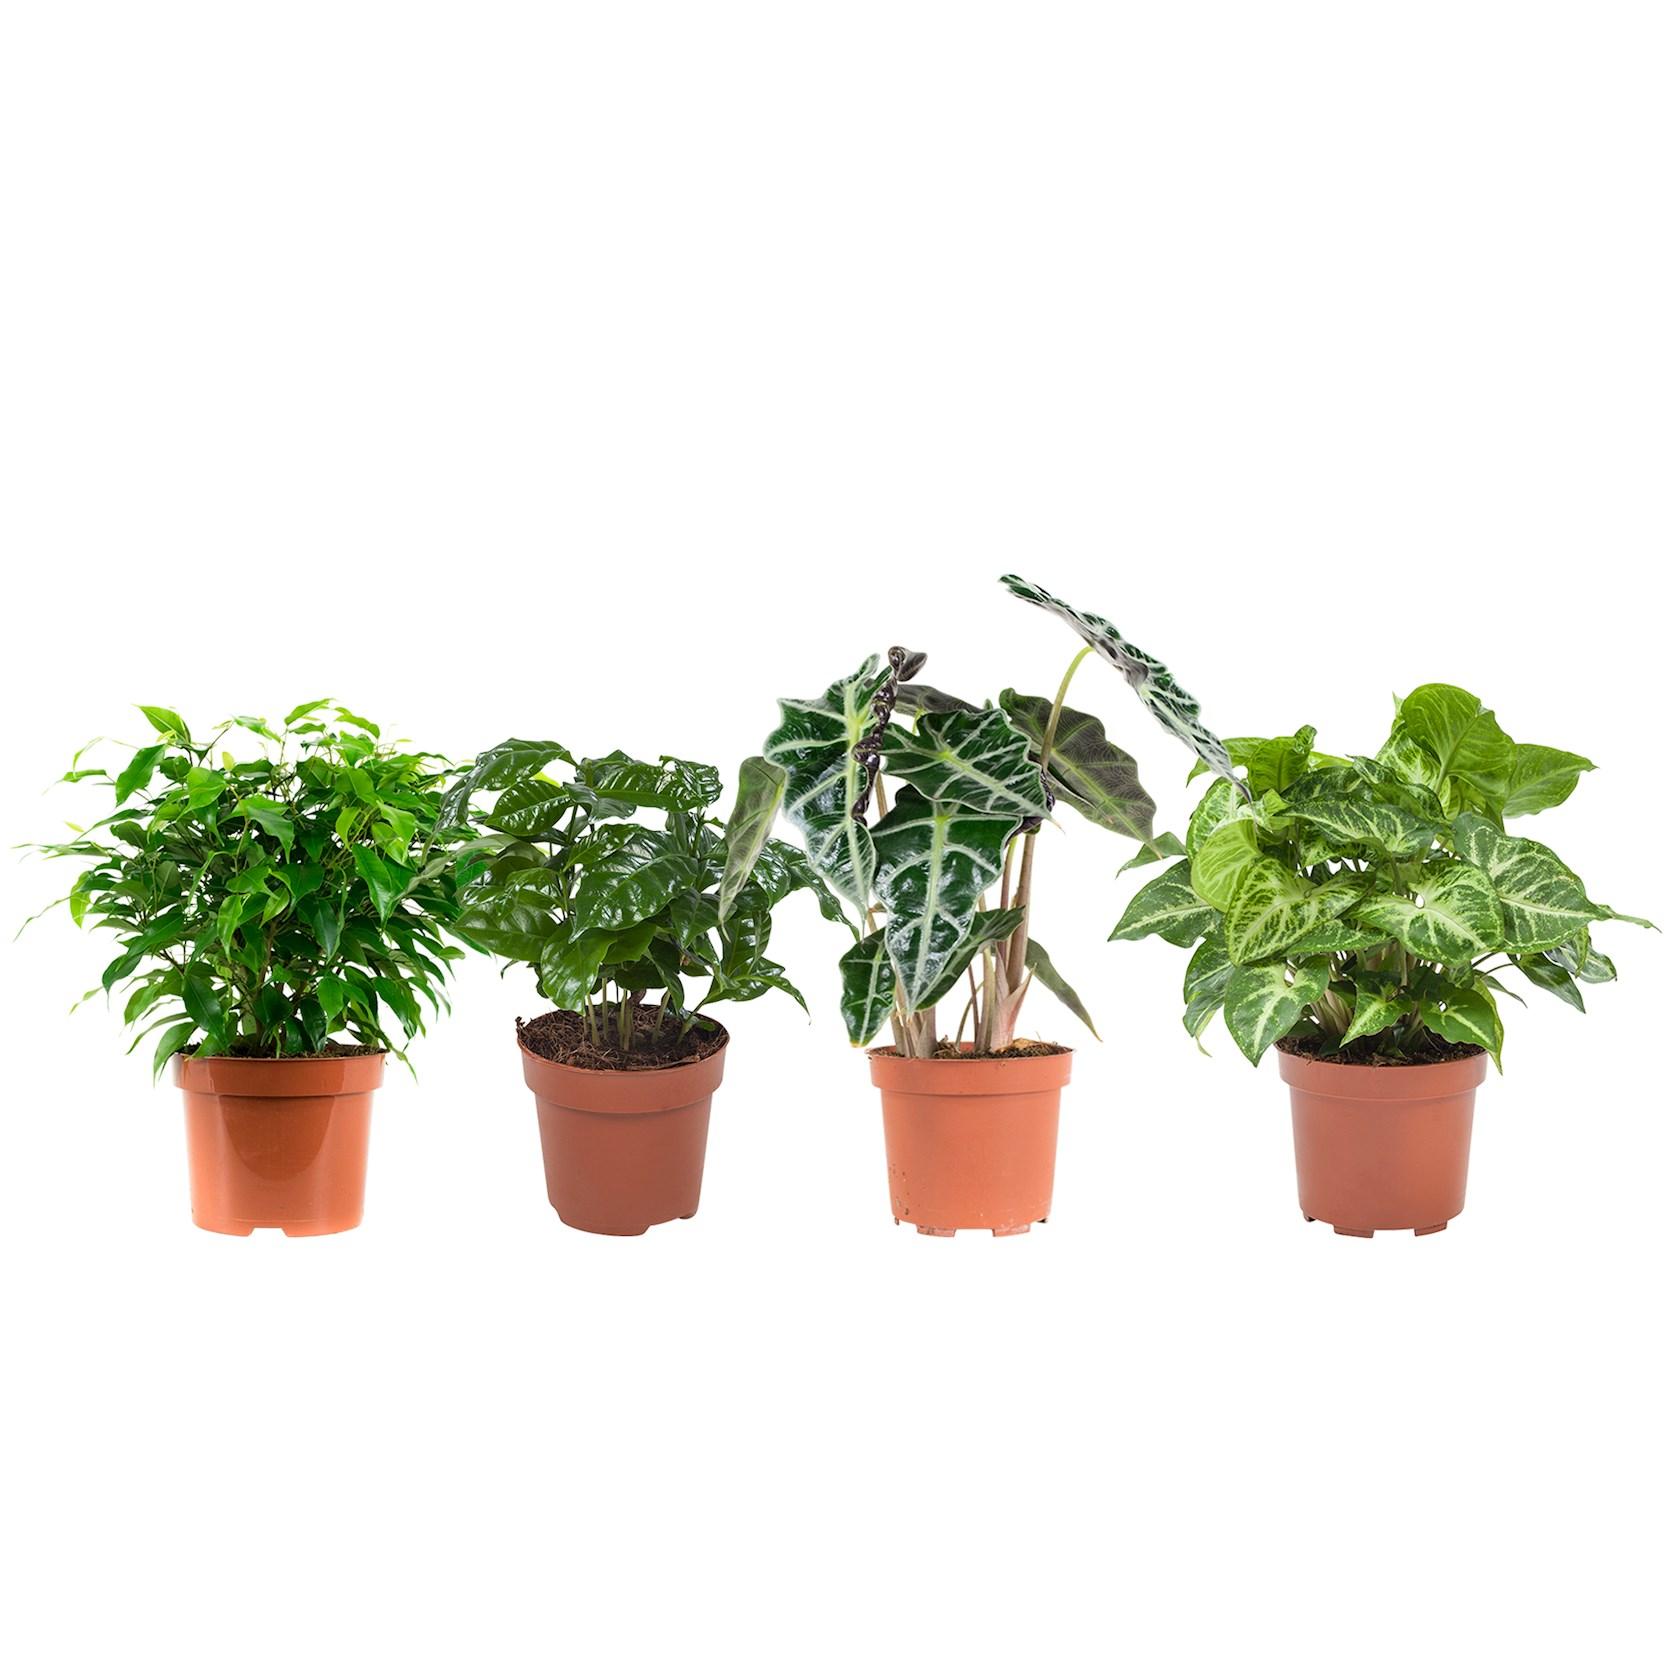 4 stuks Ficus (Ficus Green Kinky), Koffieplant (Coffea Arabica), Olifantsoor of Skeletplant (Alocasia Polly), Syngonium Arrow - pot 12cm - hoogte 25cm